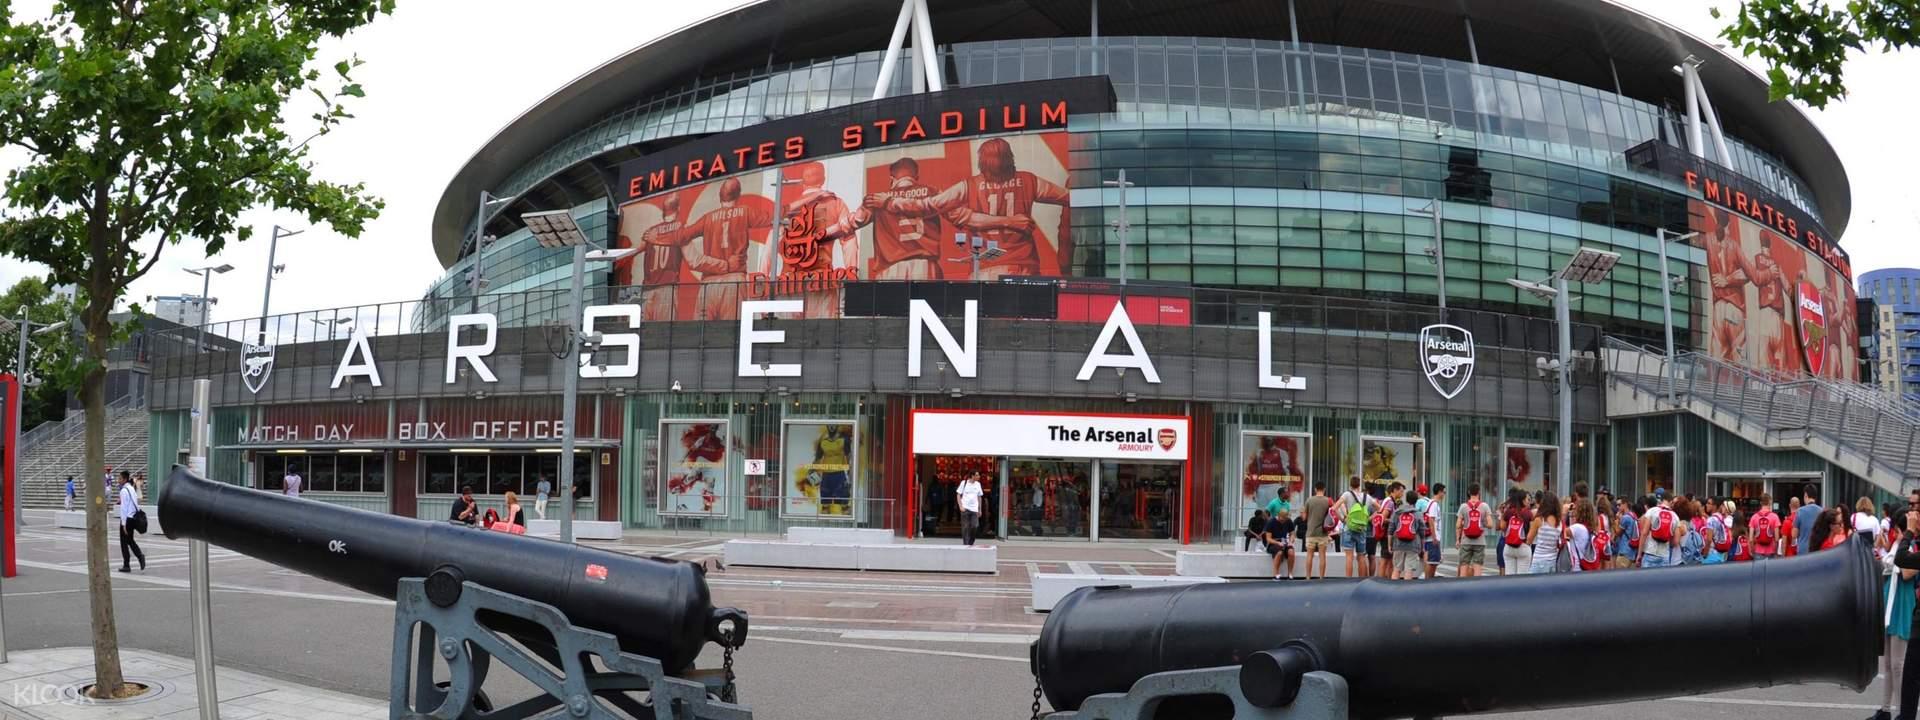 Arsenal FC Football Match Tickets at Emirates 2019/2020 ...